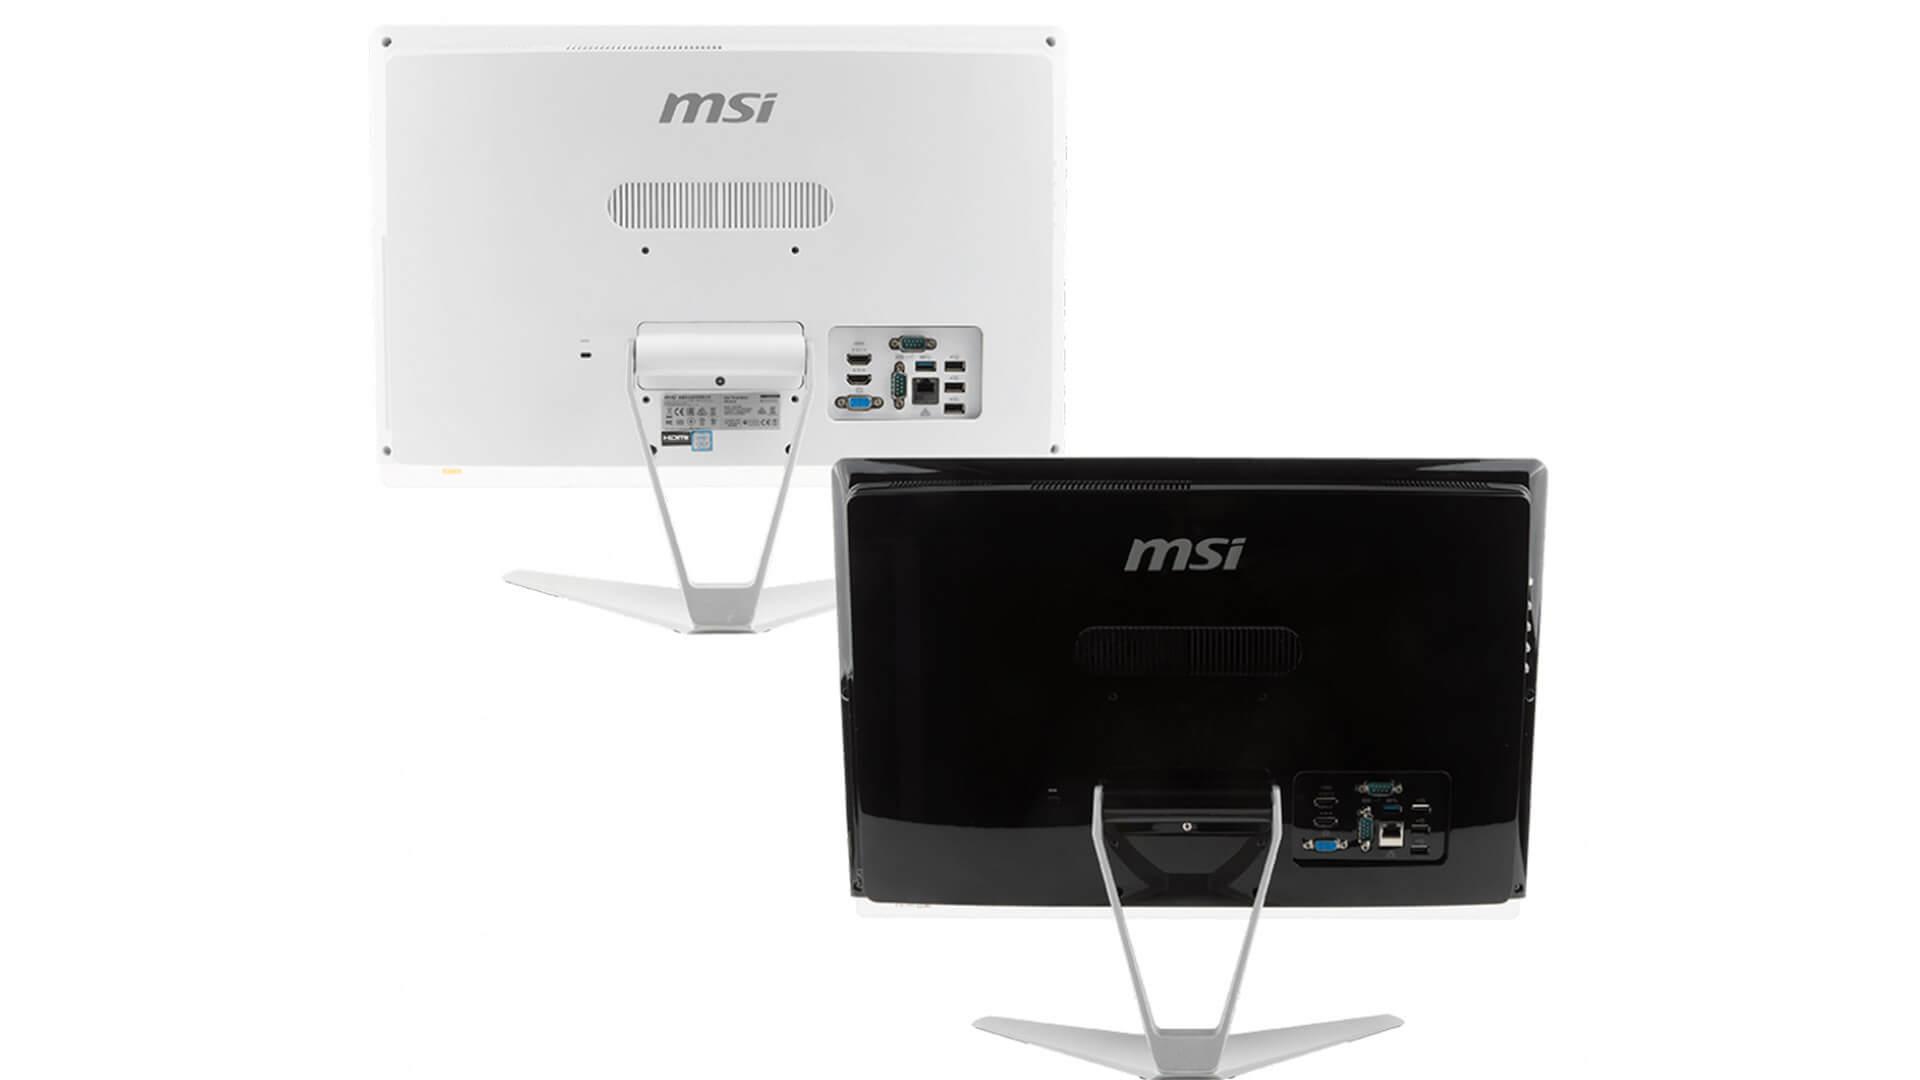 Msi Pro20 EXT 7M